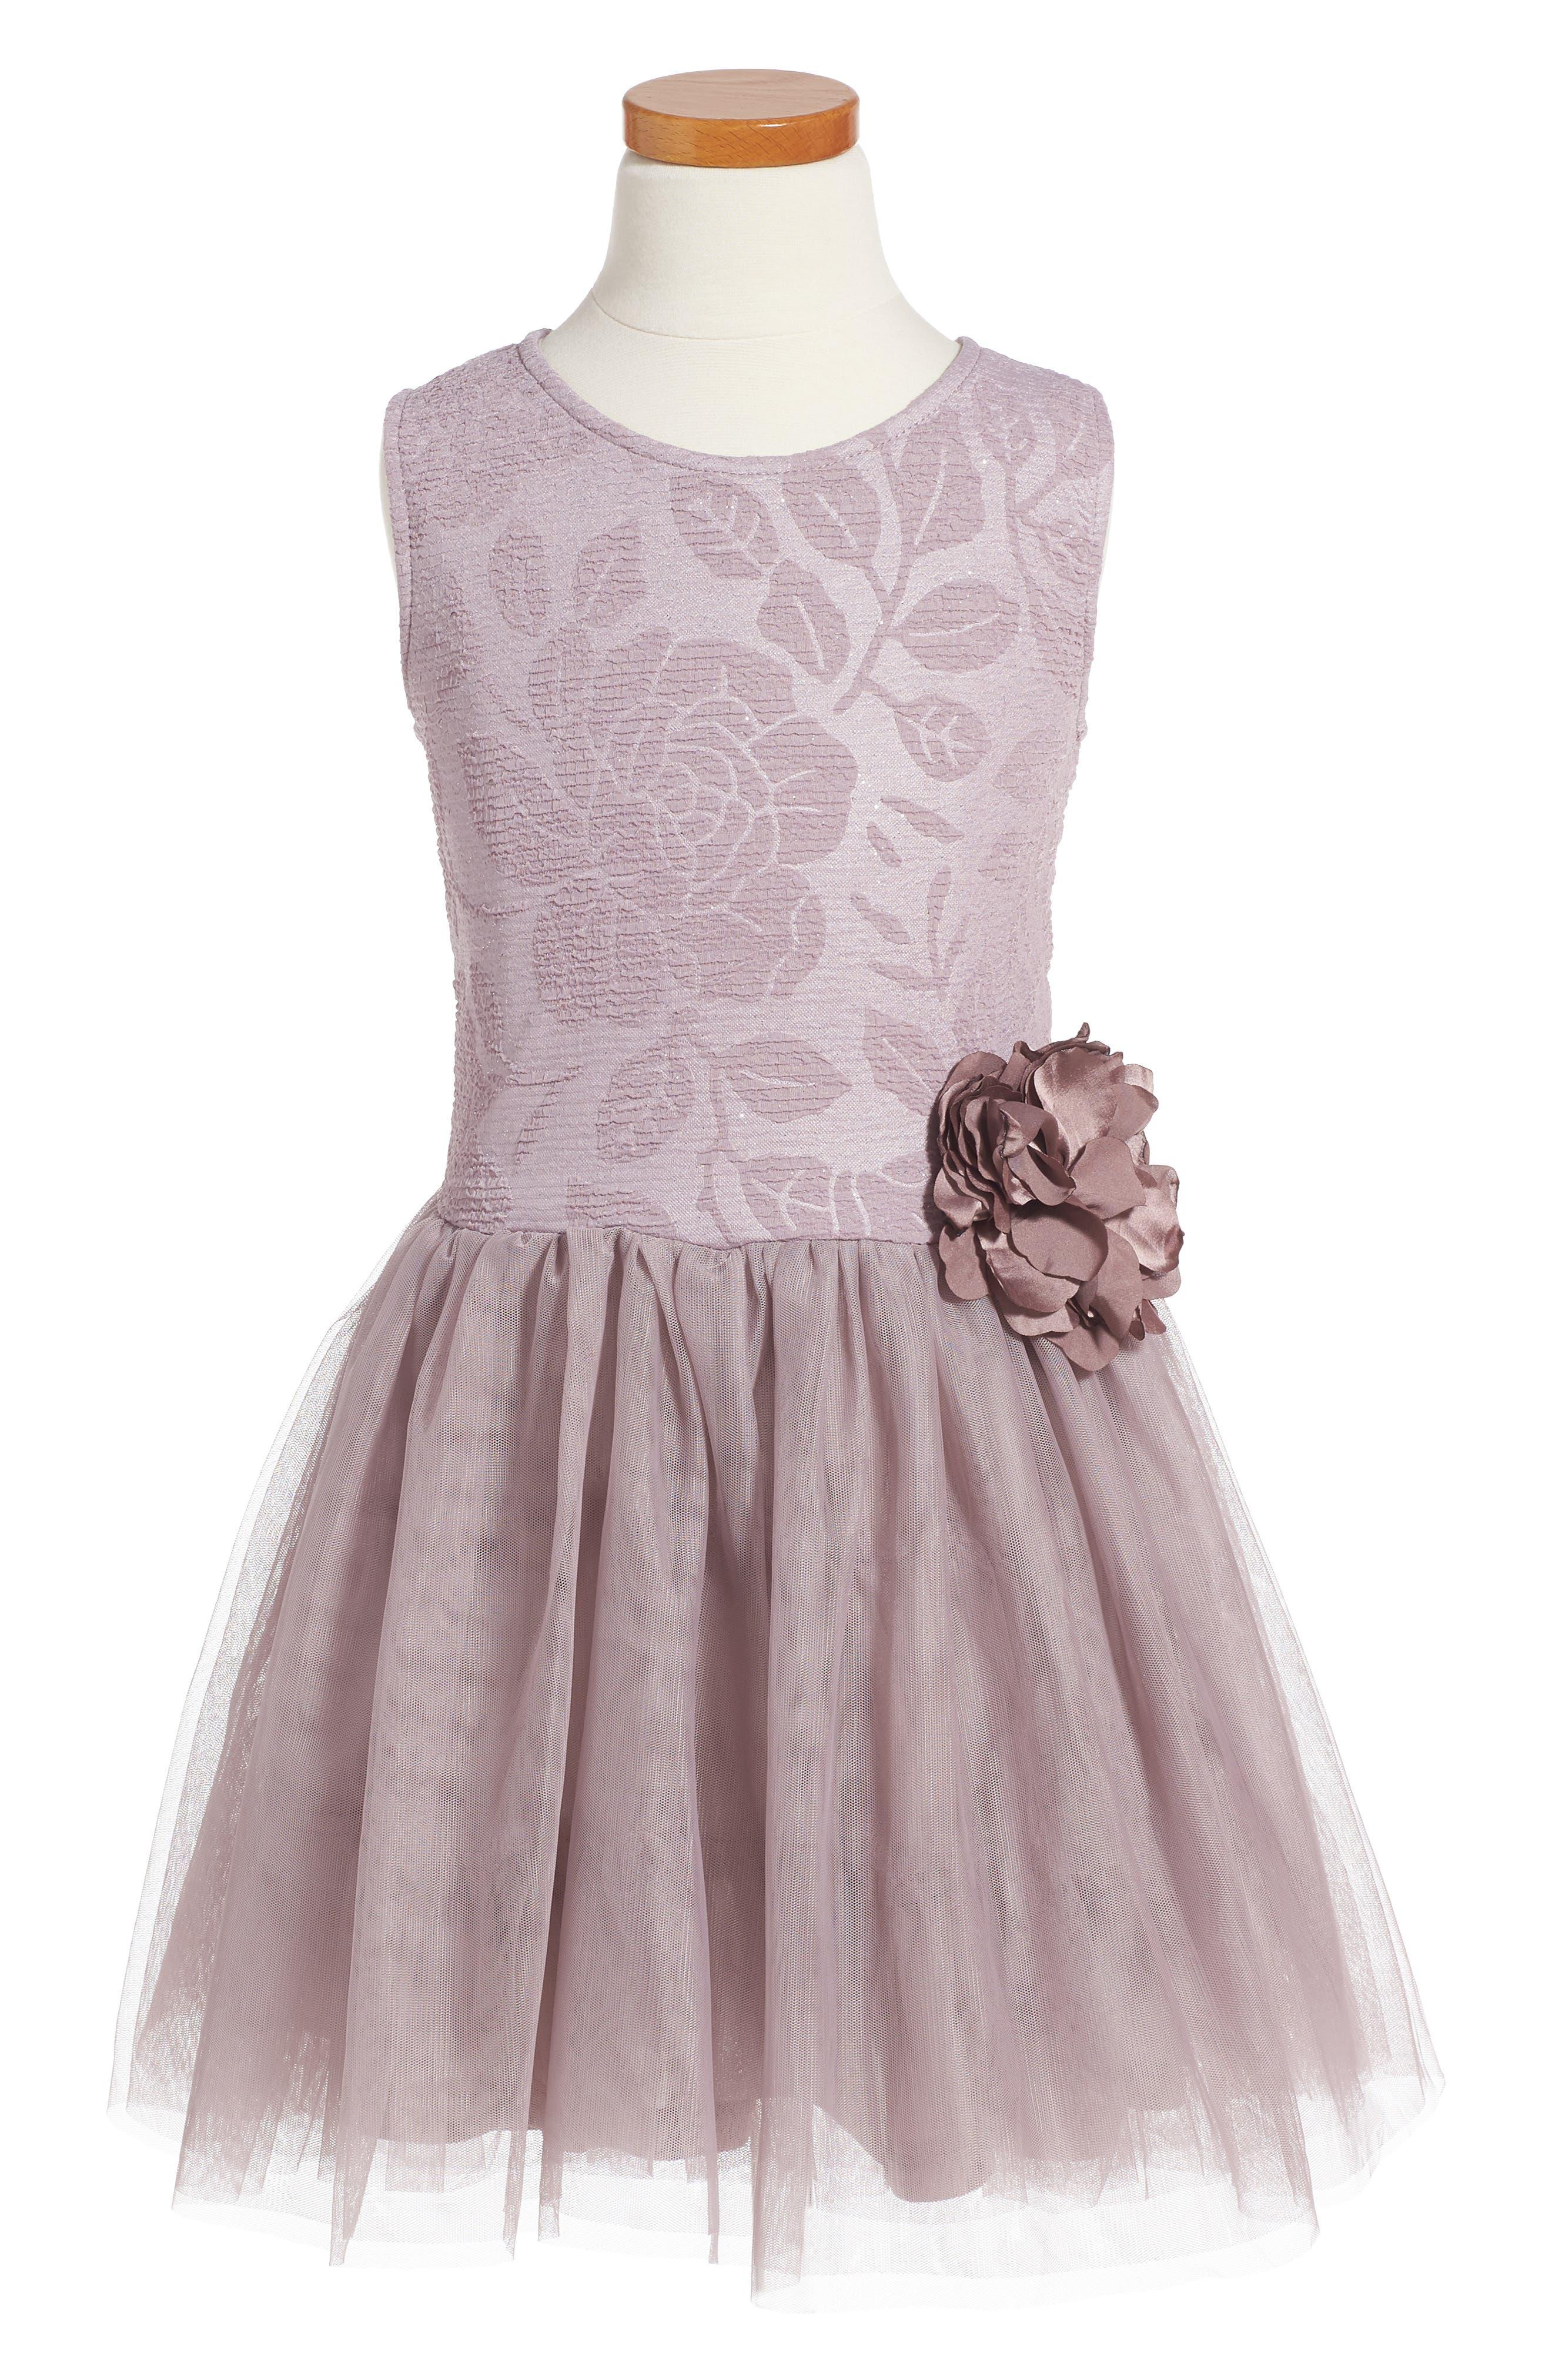 Embossed Rose Tutu Dress,                         Main,                         color, Mauve